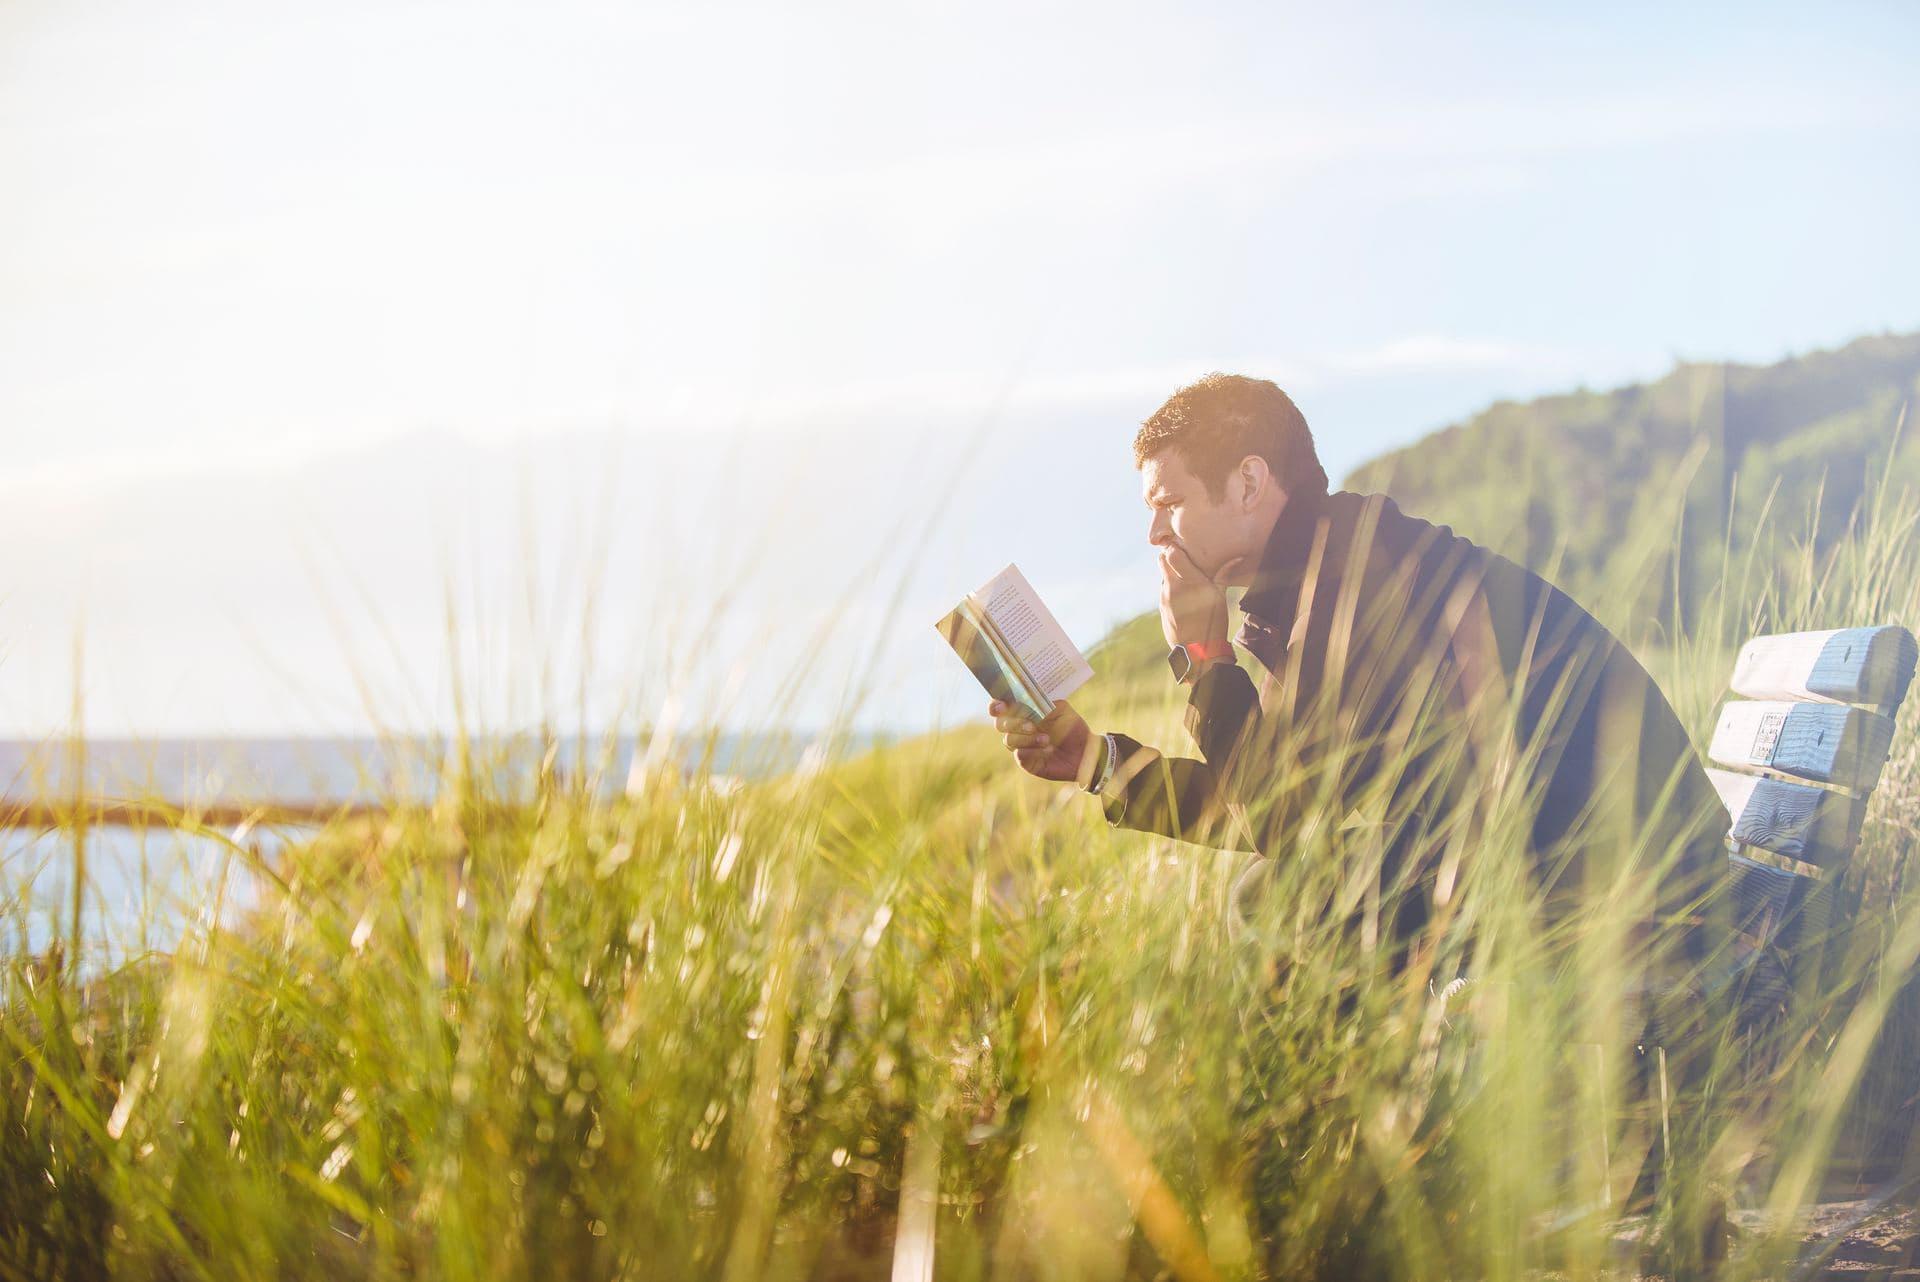 Resisting Temptation Through Ignatian Spirituality: Moral Conversion Series #5